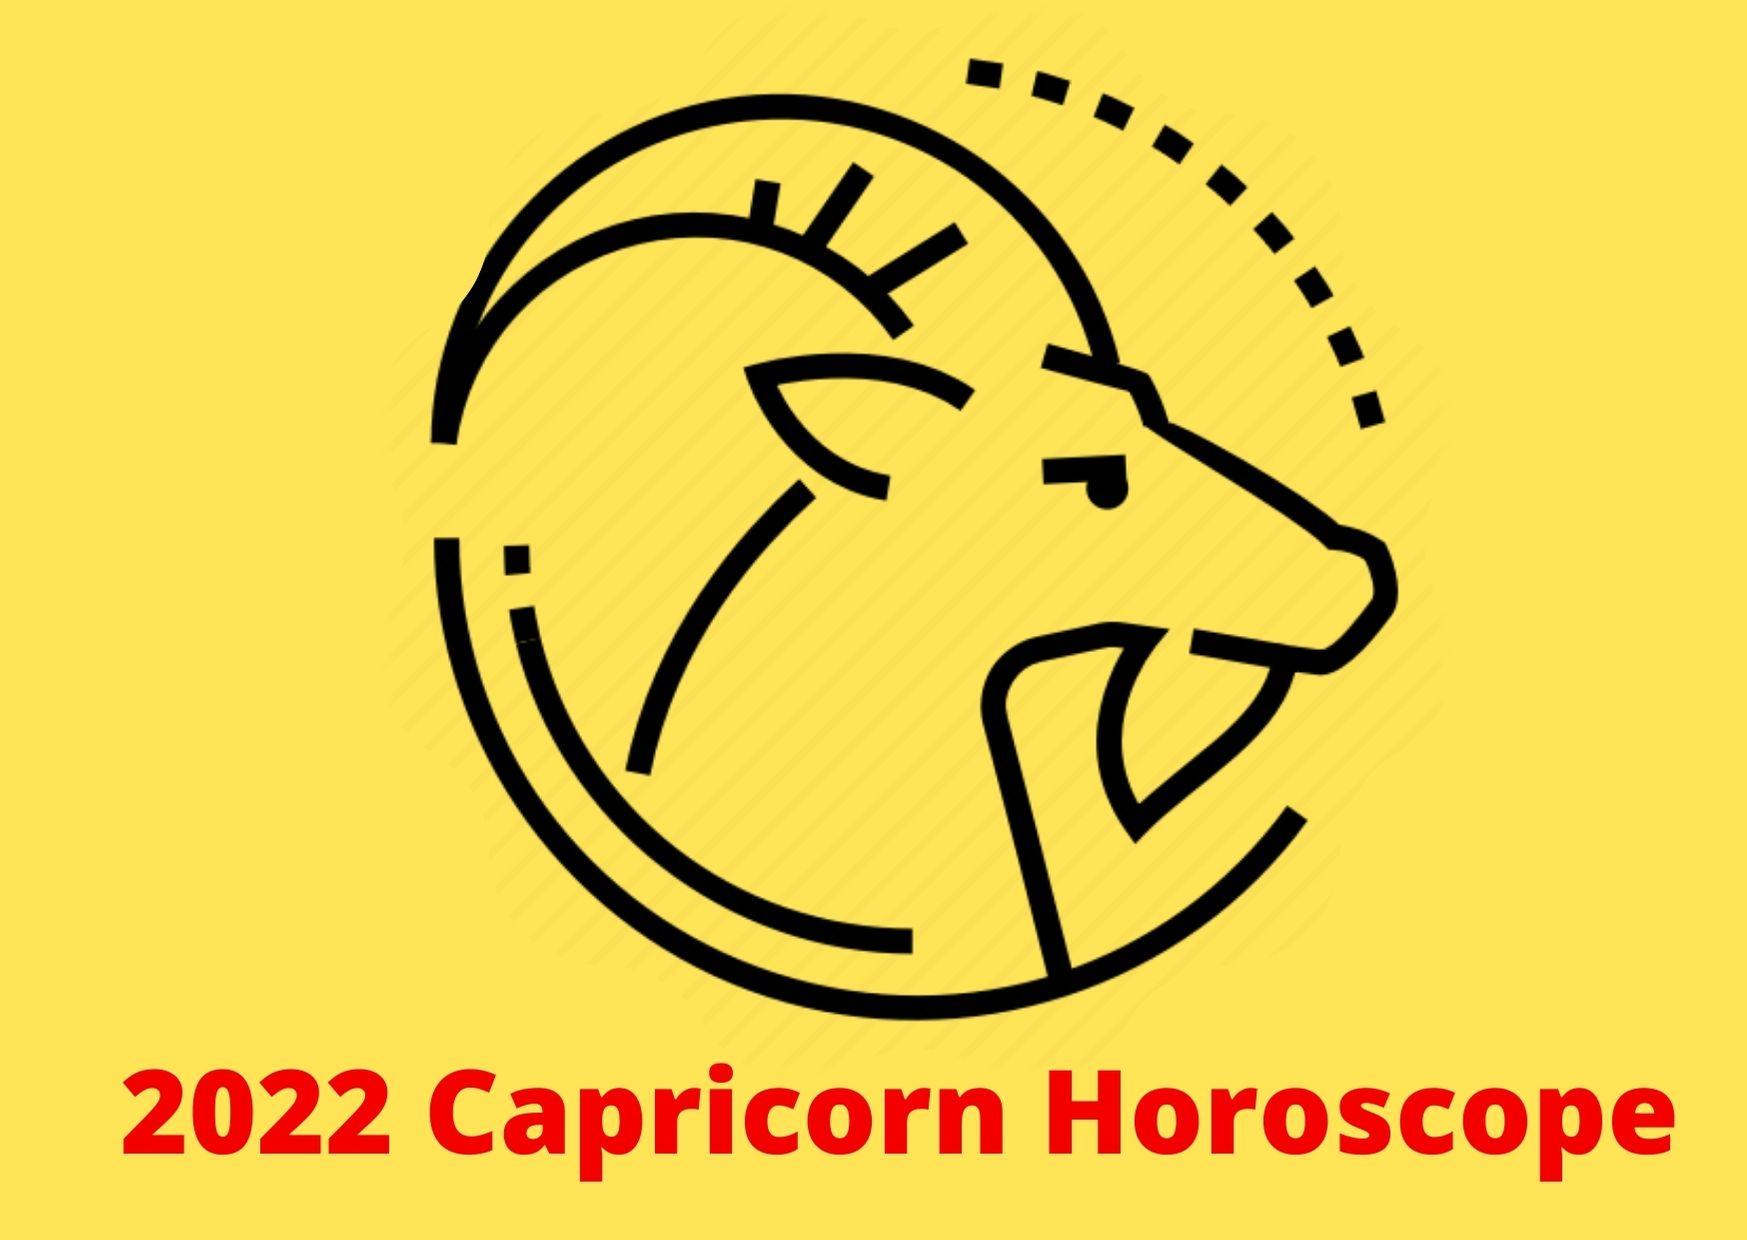 2022 Capricorn Horoscope